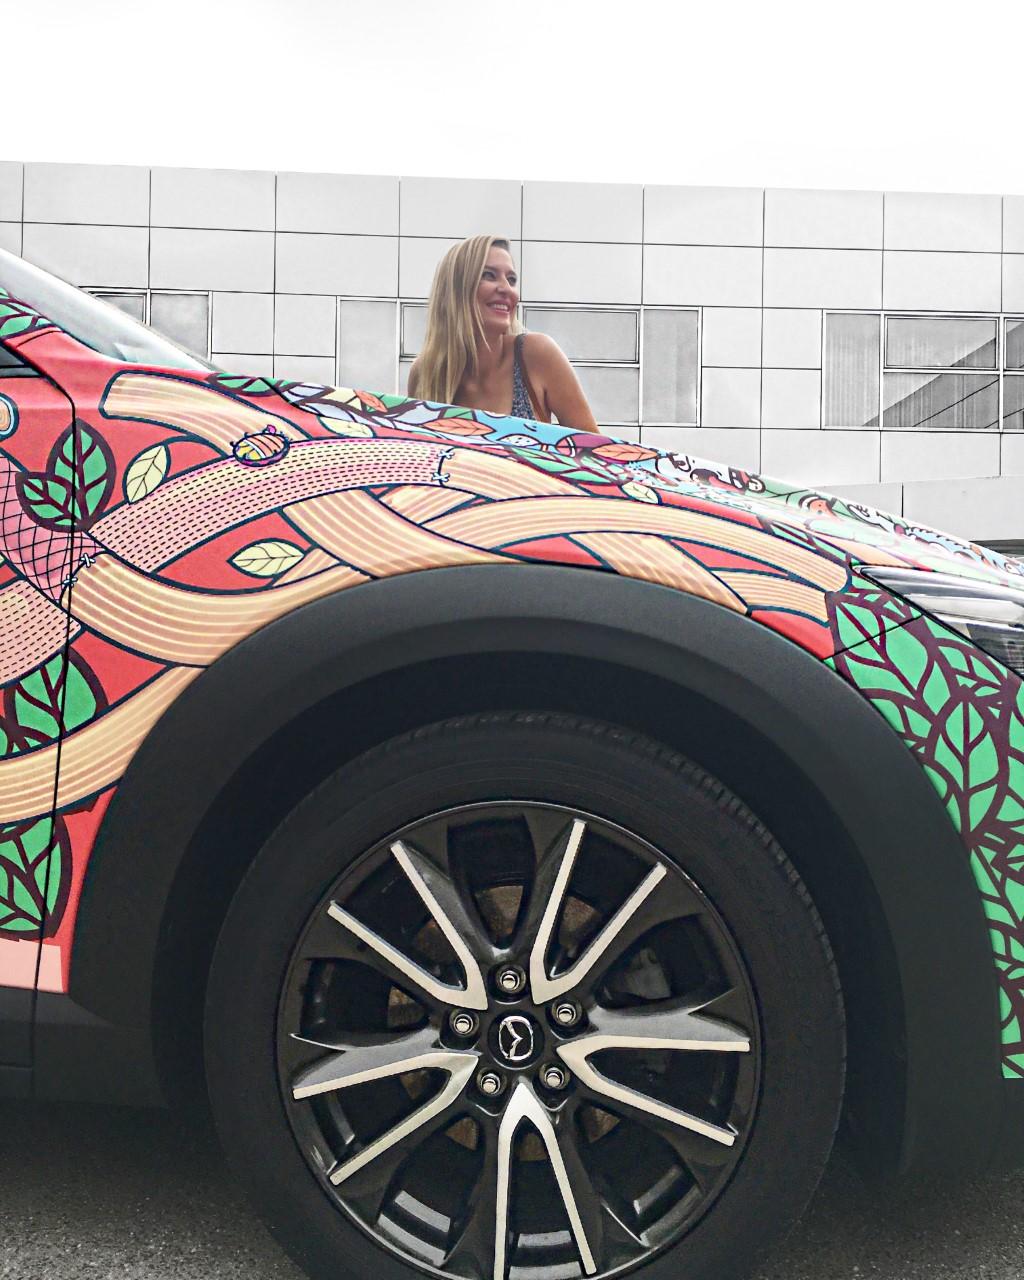 Mazda_CX3_Bymyheels_Tomorrowland_Lara_Martin_Gilarranz (4)